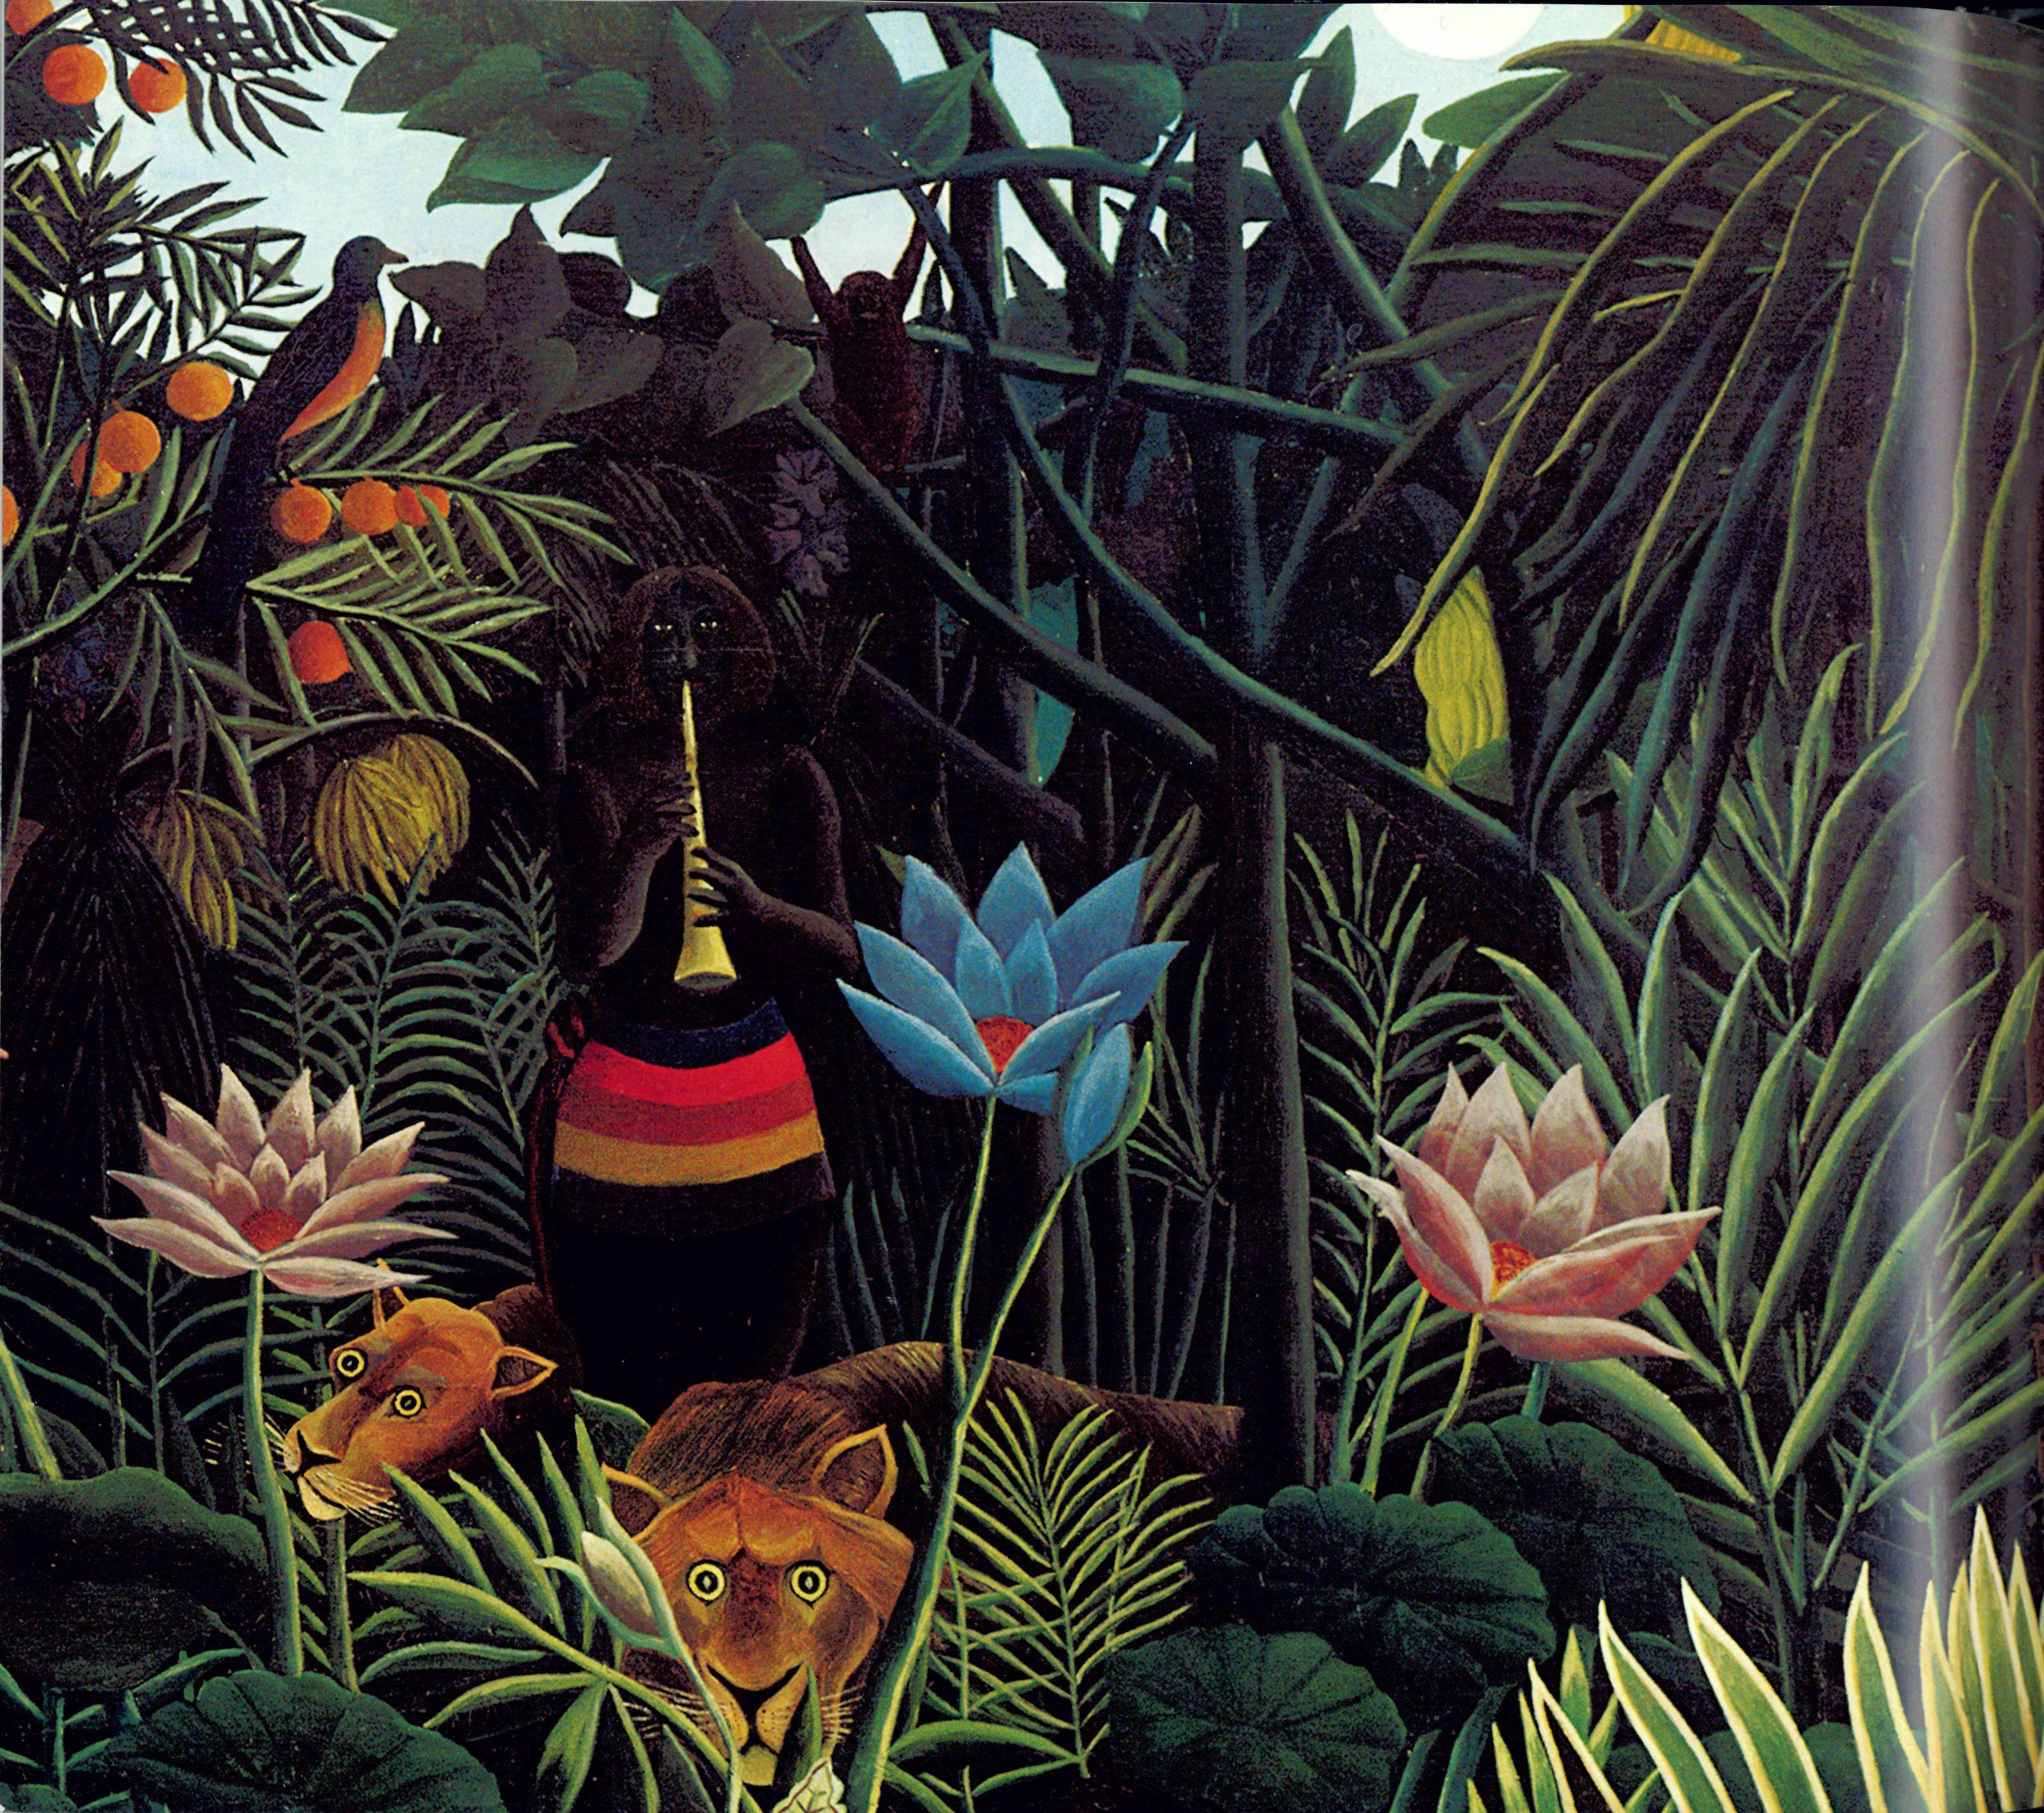 Henri Rousseau - Traumgarten (Dream garden) | Eerie art ...